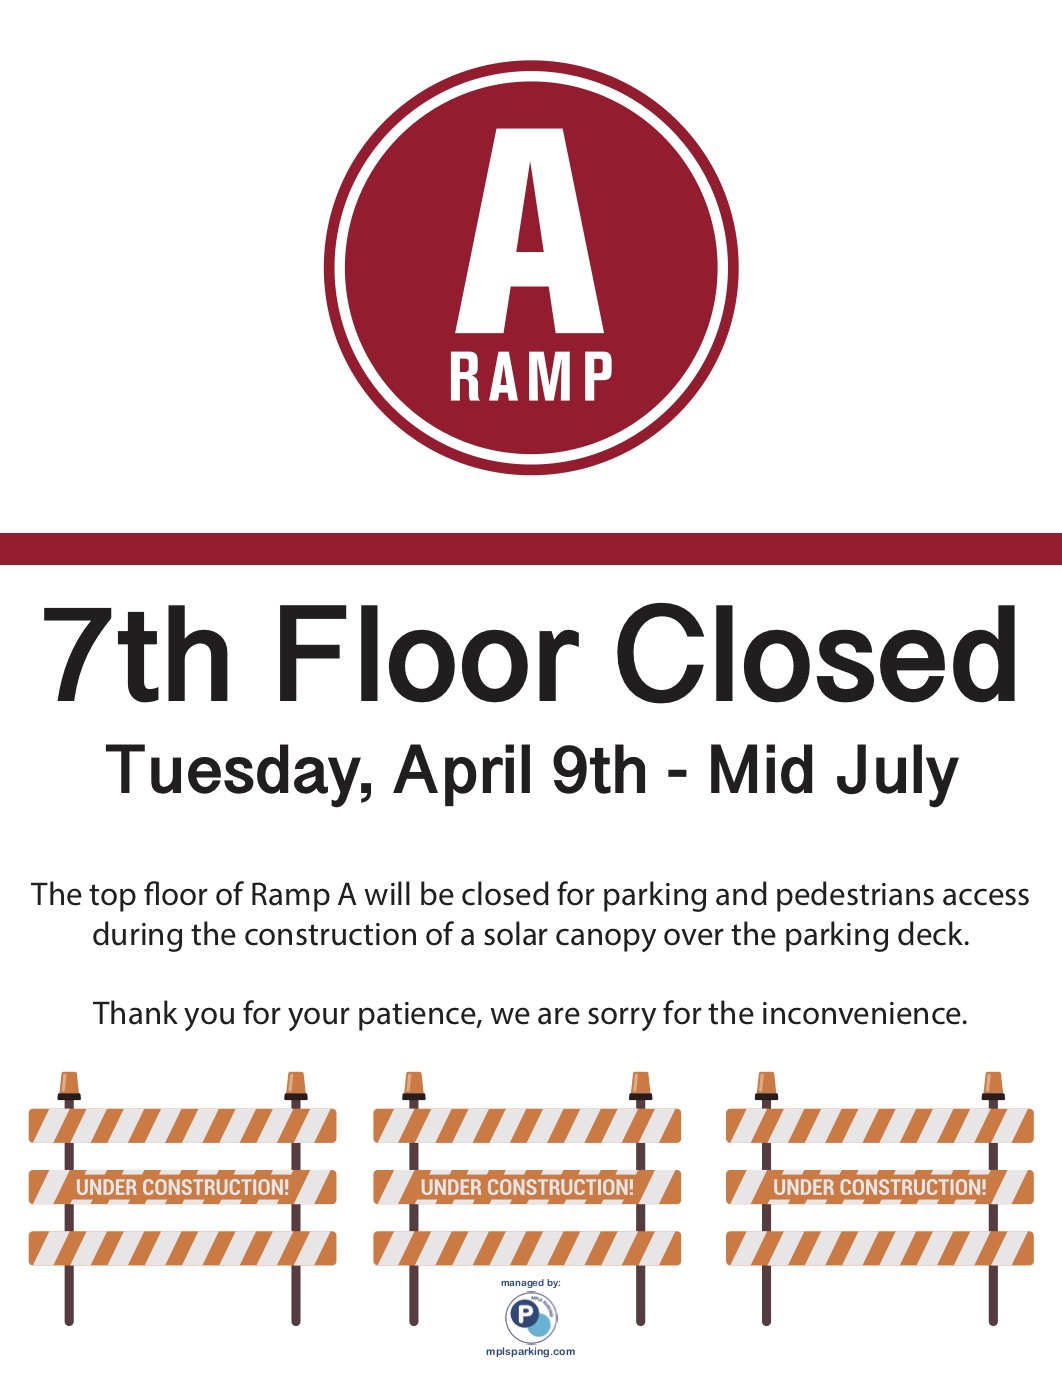 Ramp A - Top Deck Closure.jpg